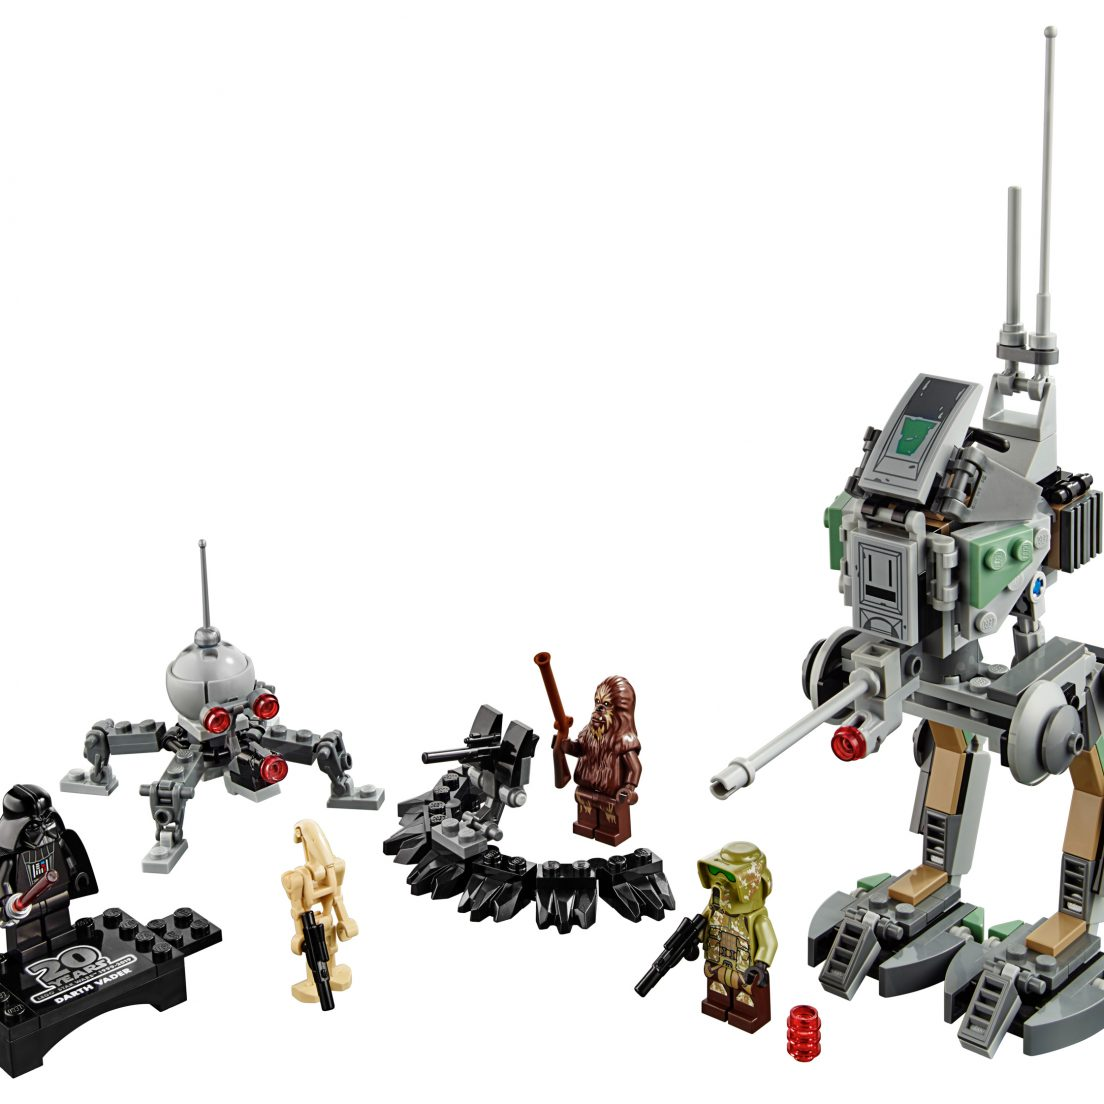 lego-star-wars-75261-clone-scout-walker-20th-anniversary-edition-1104x1104.jpg